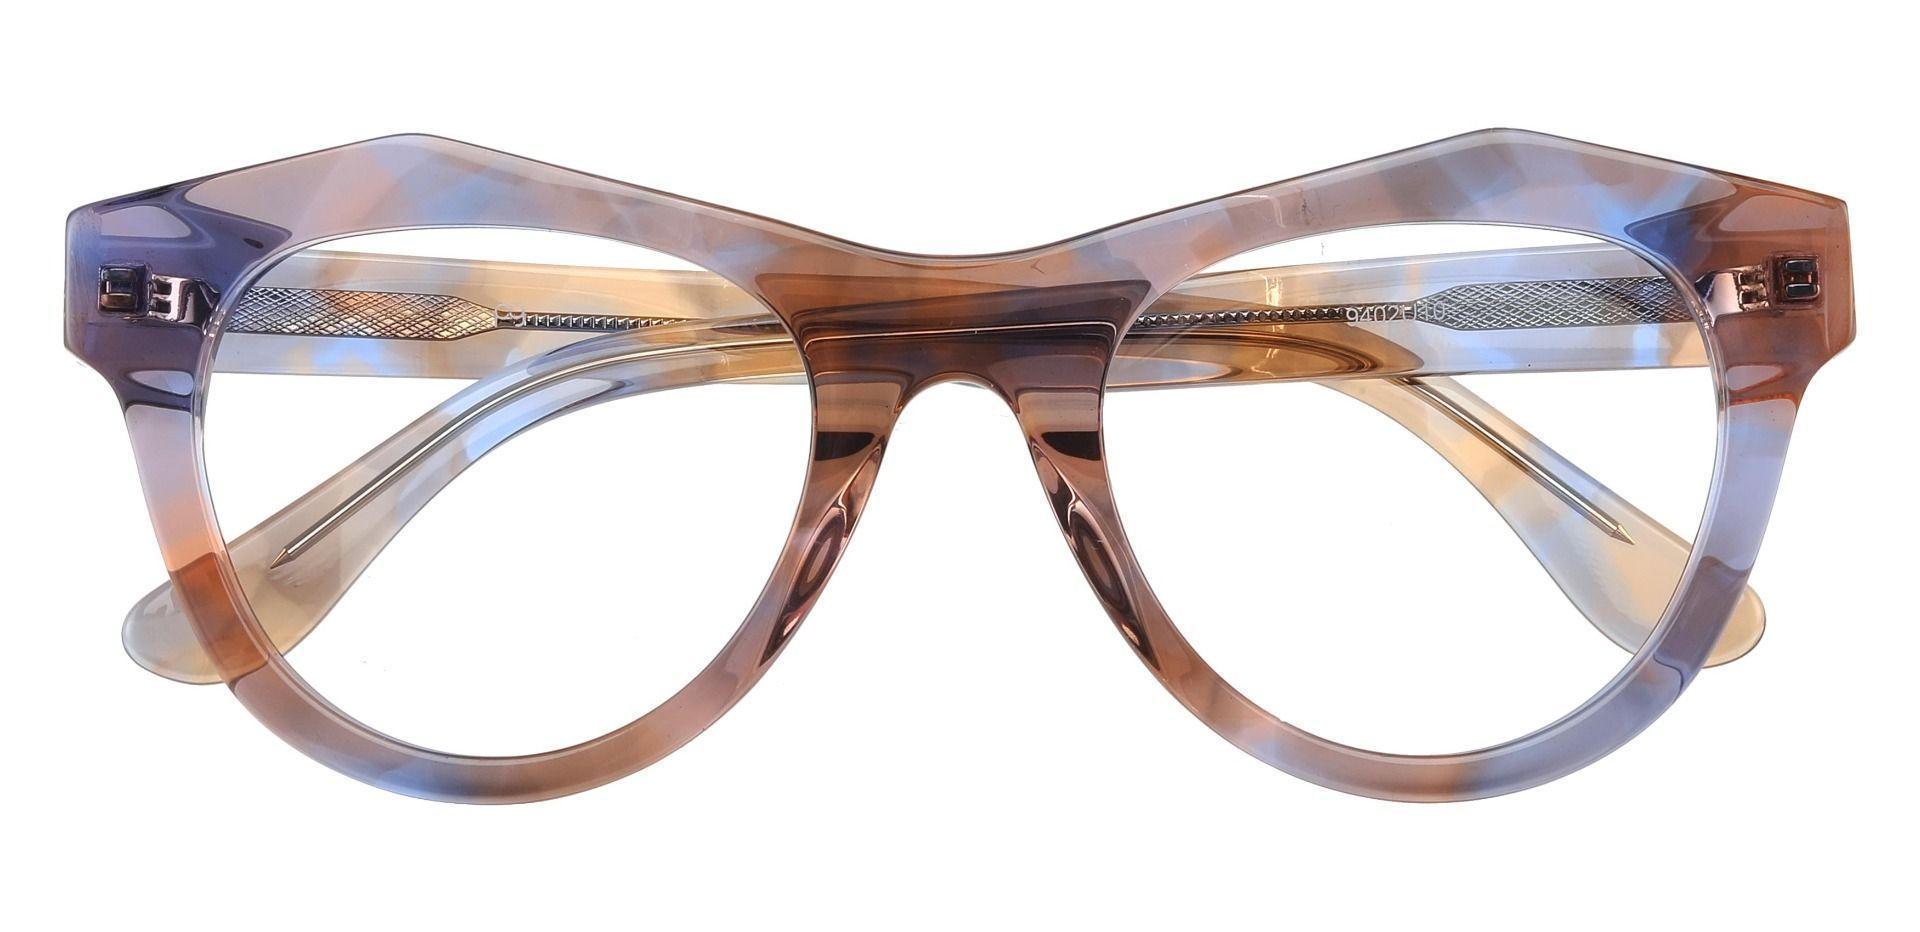 Jensen Geometric Prescription Glasses - Two